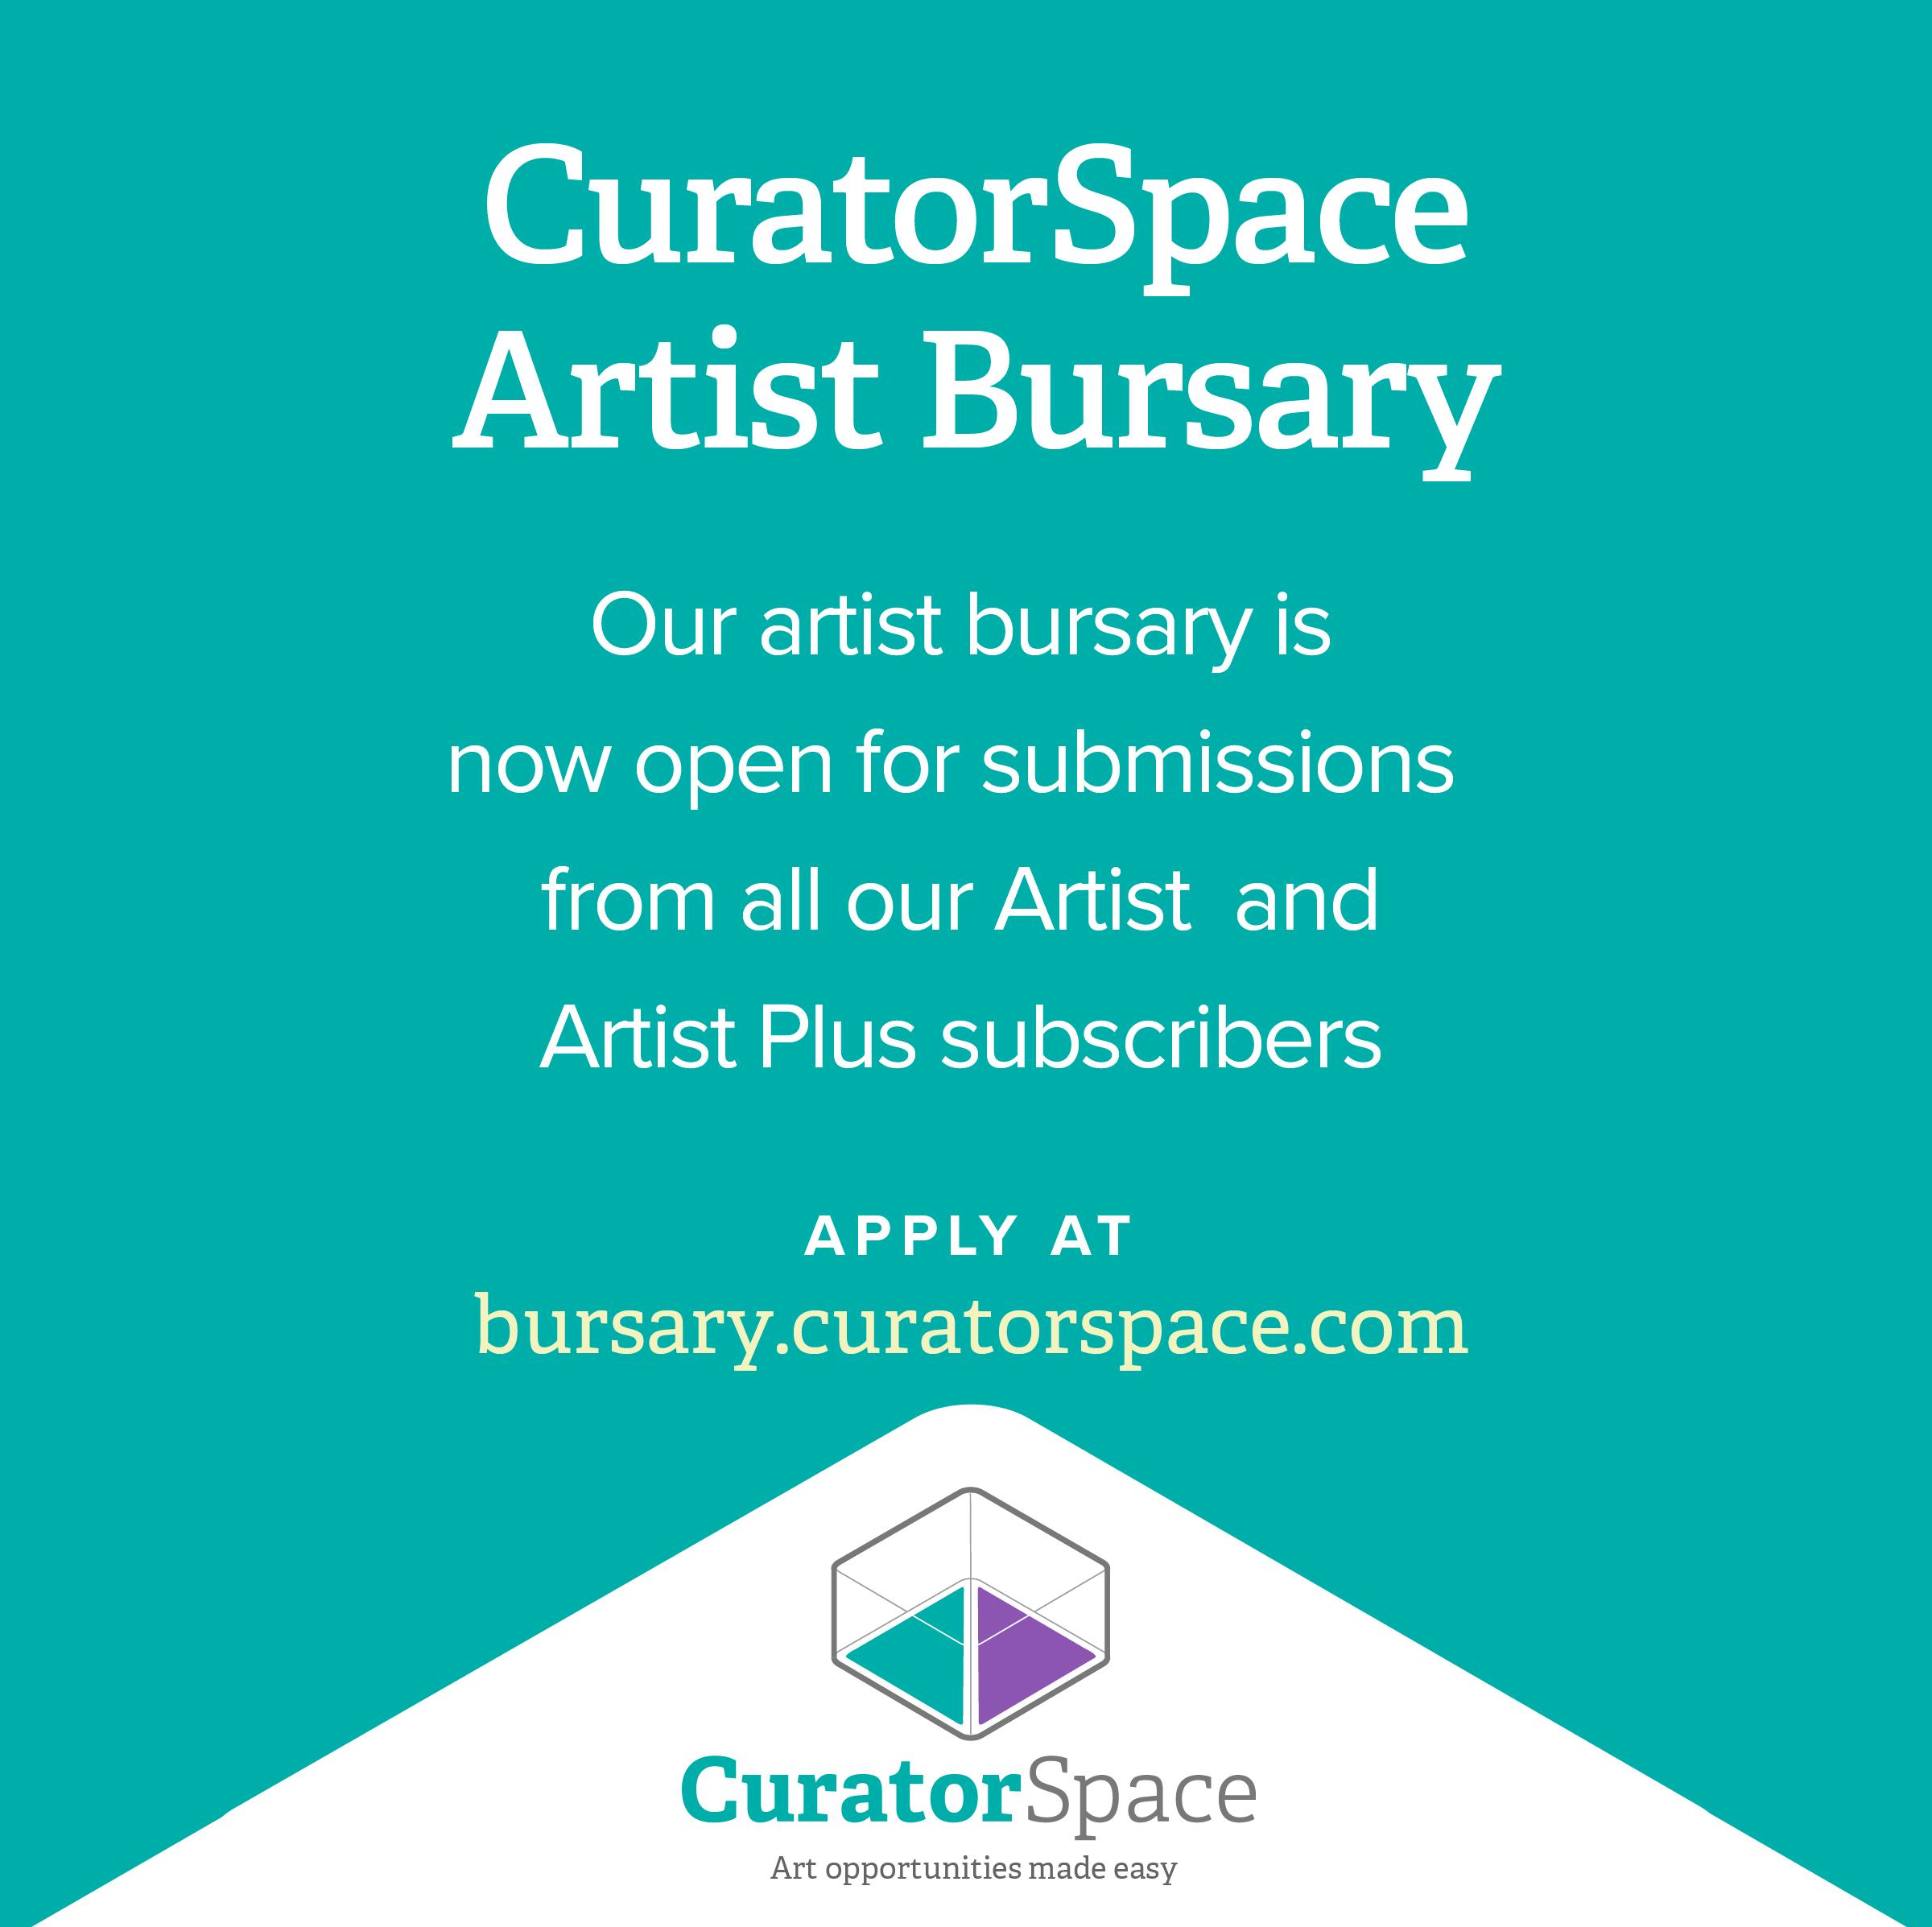 CuratorSpace Artist Bursary #7